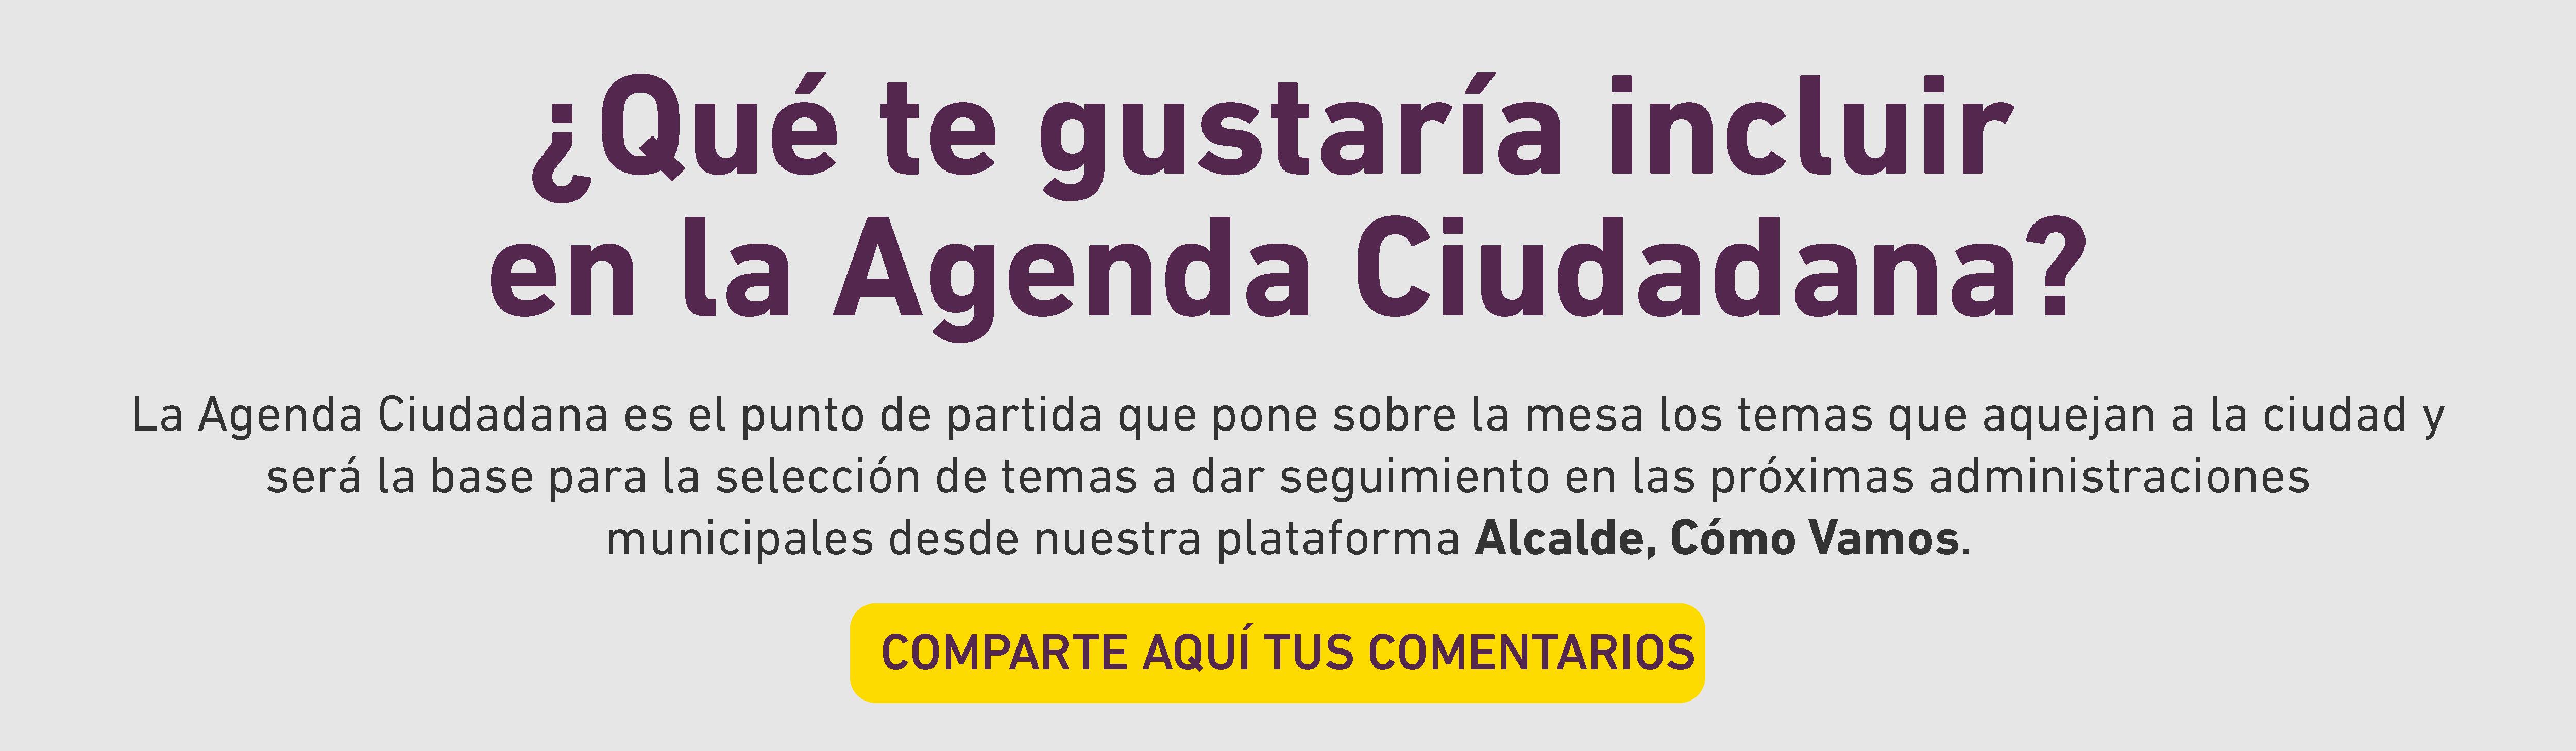 Slider agenda ciudadana 2018 01